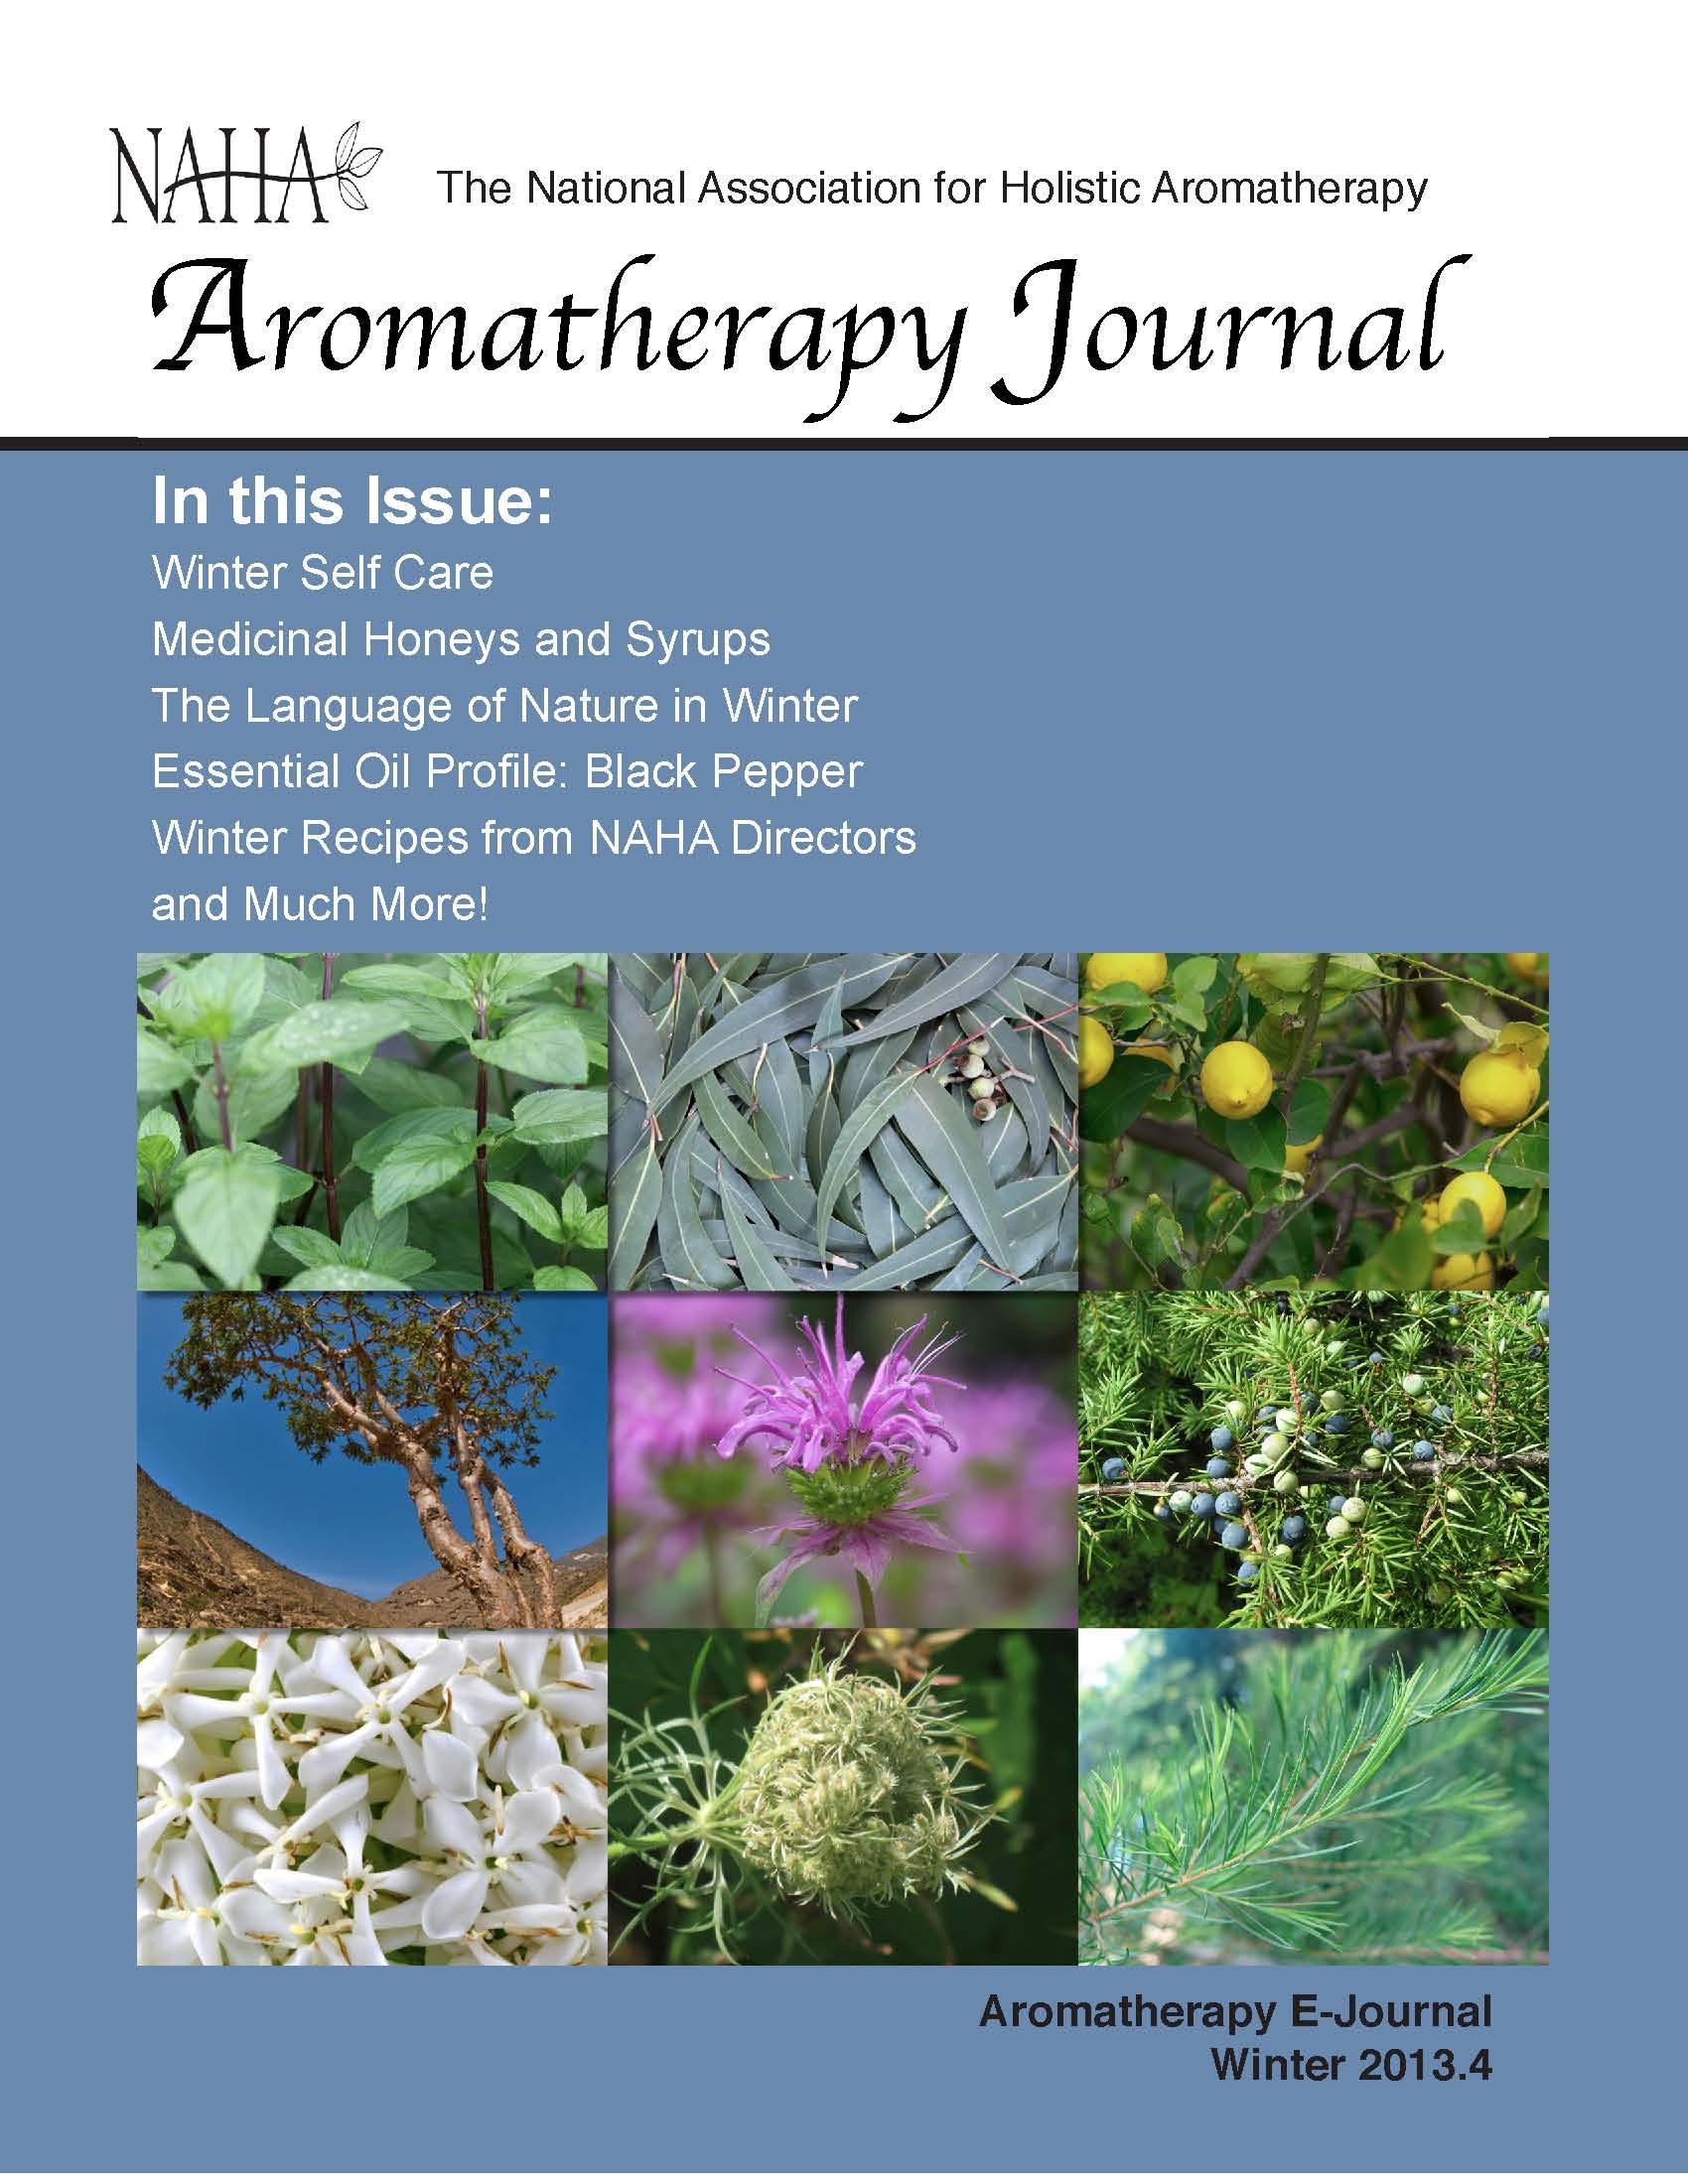 NAHA's Aromatherapy Journal Winter 2013.4